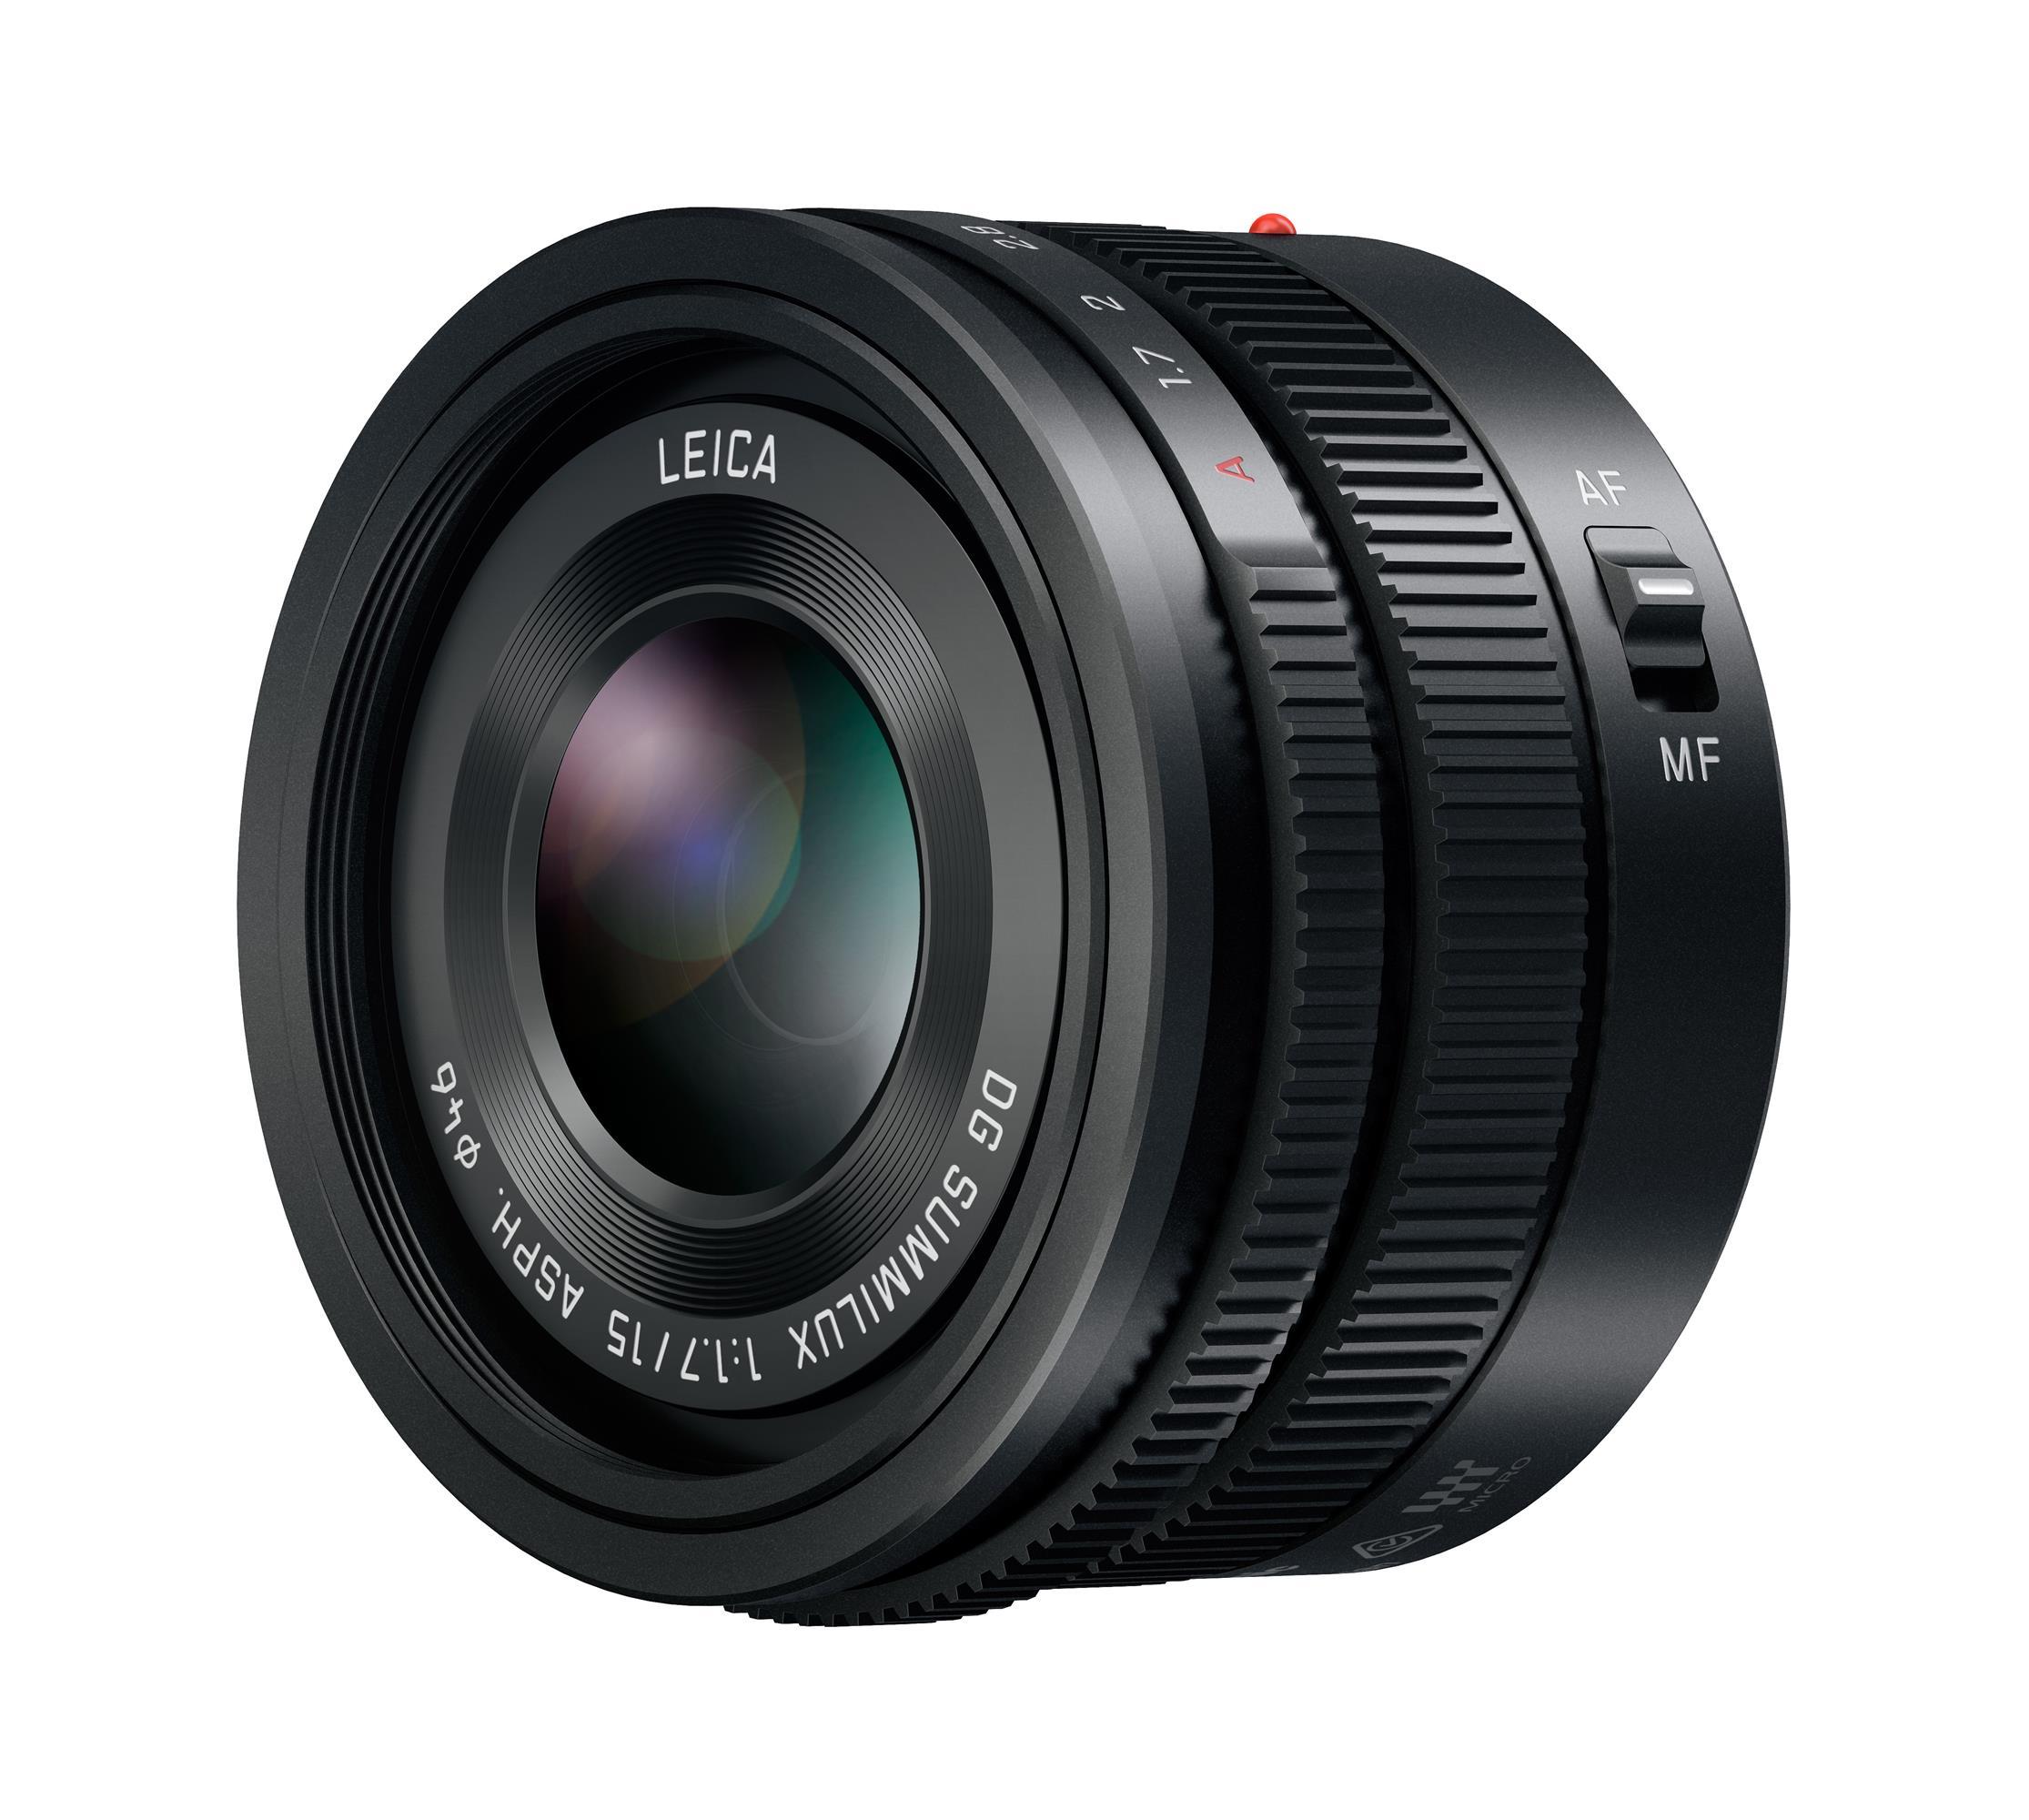 Panasonic LEICA DG 15mm F1.7